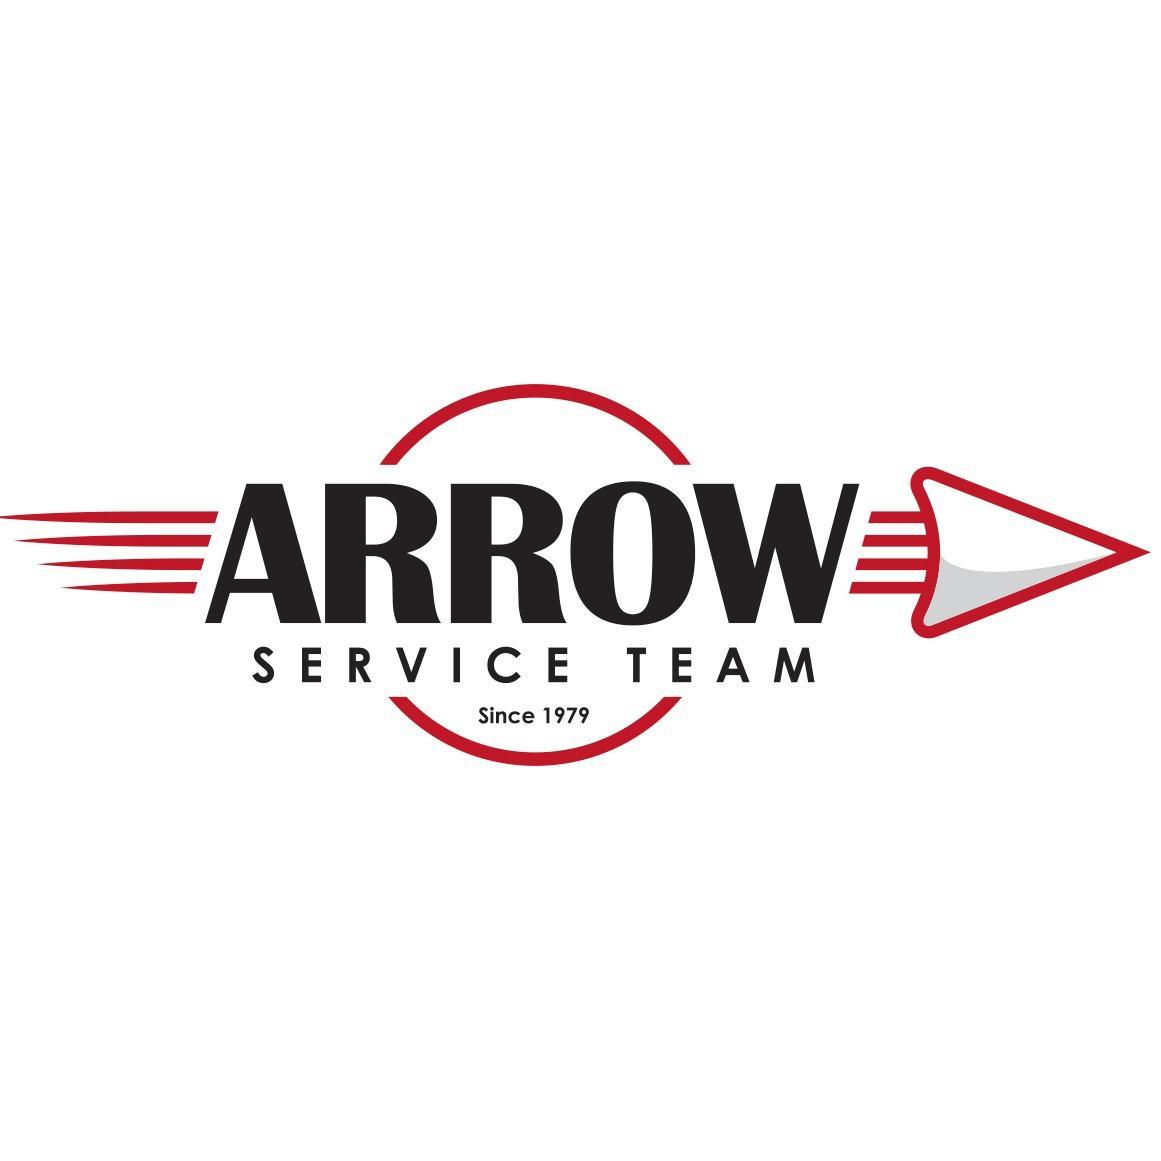 Arrow Service Team - Bismarck, ND - Water & Fire Damage Restoration